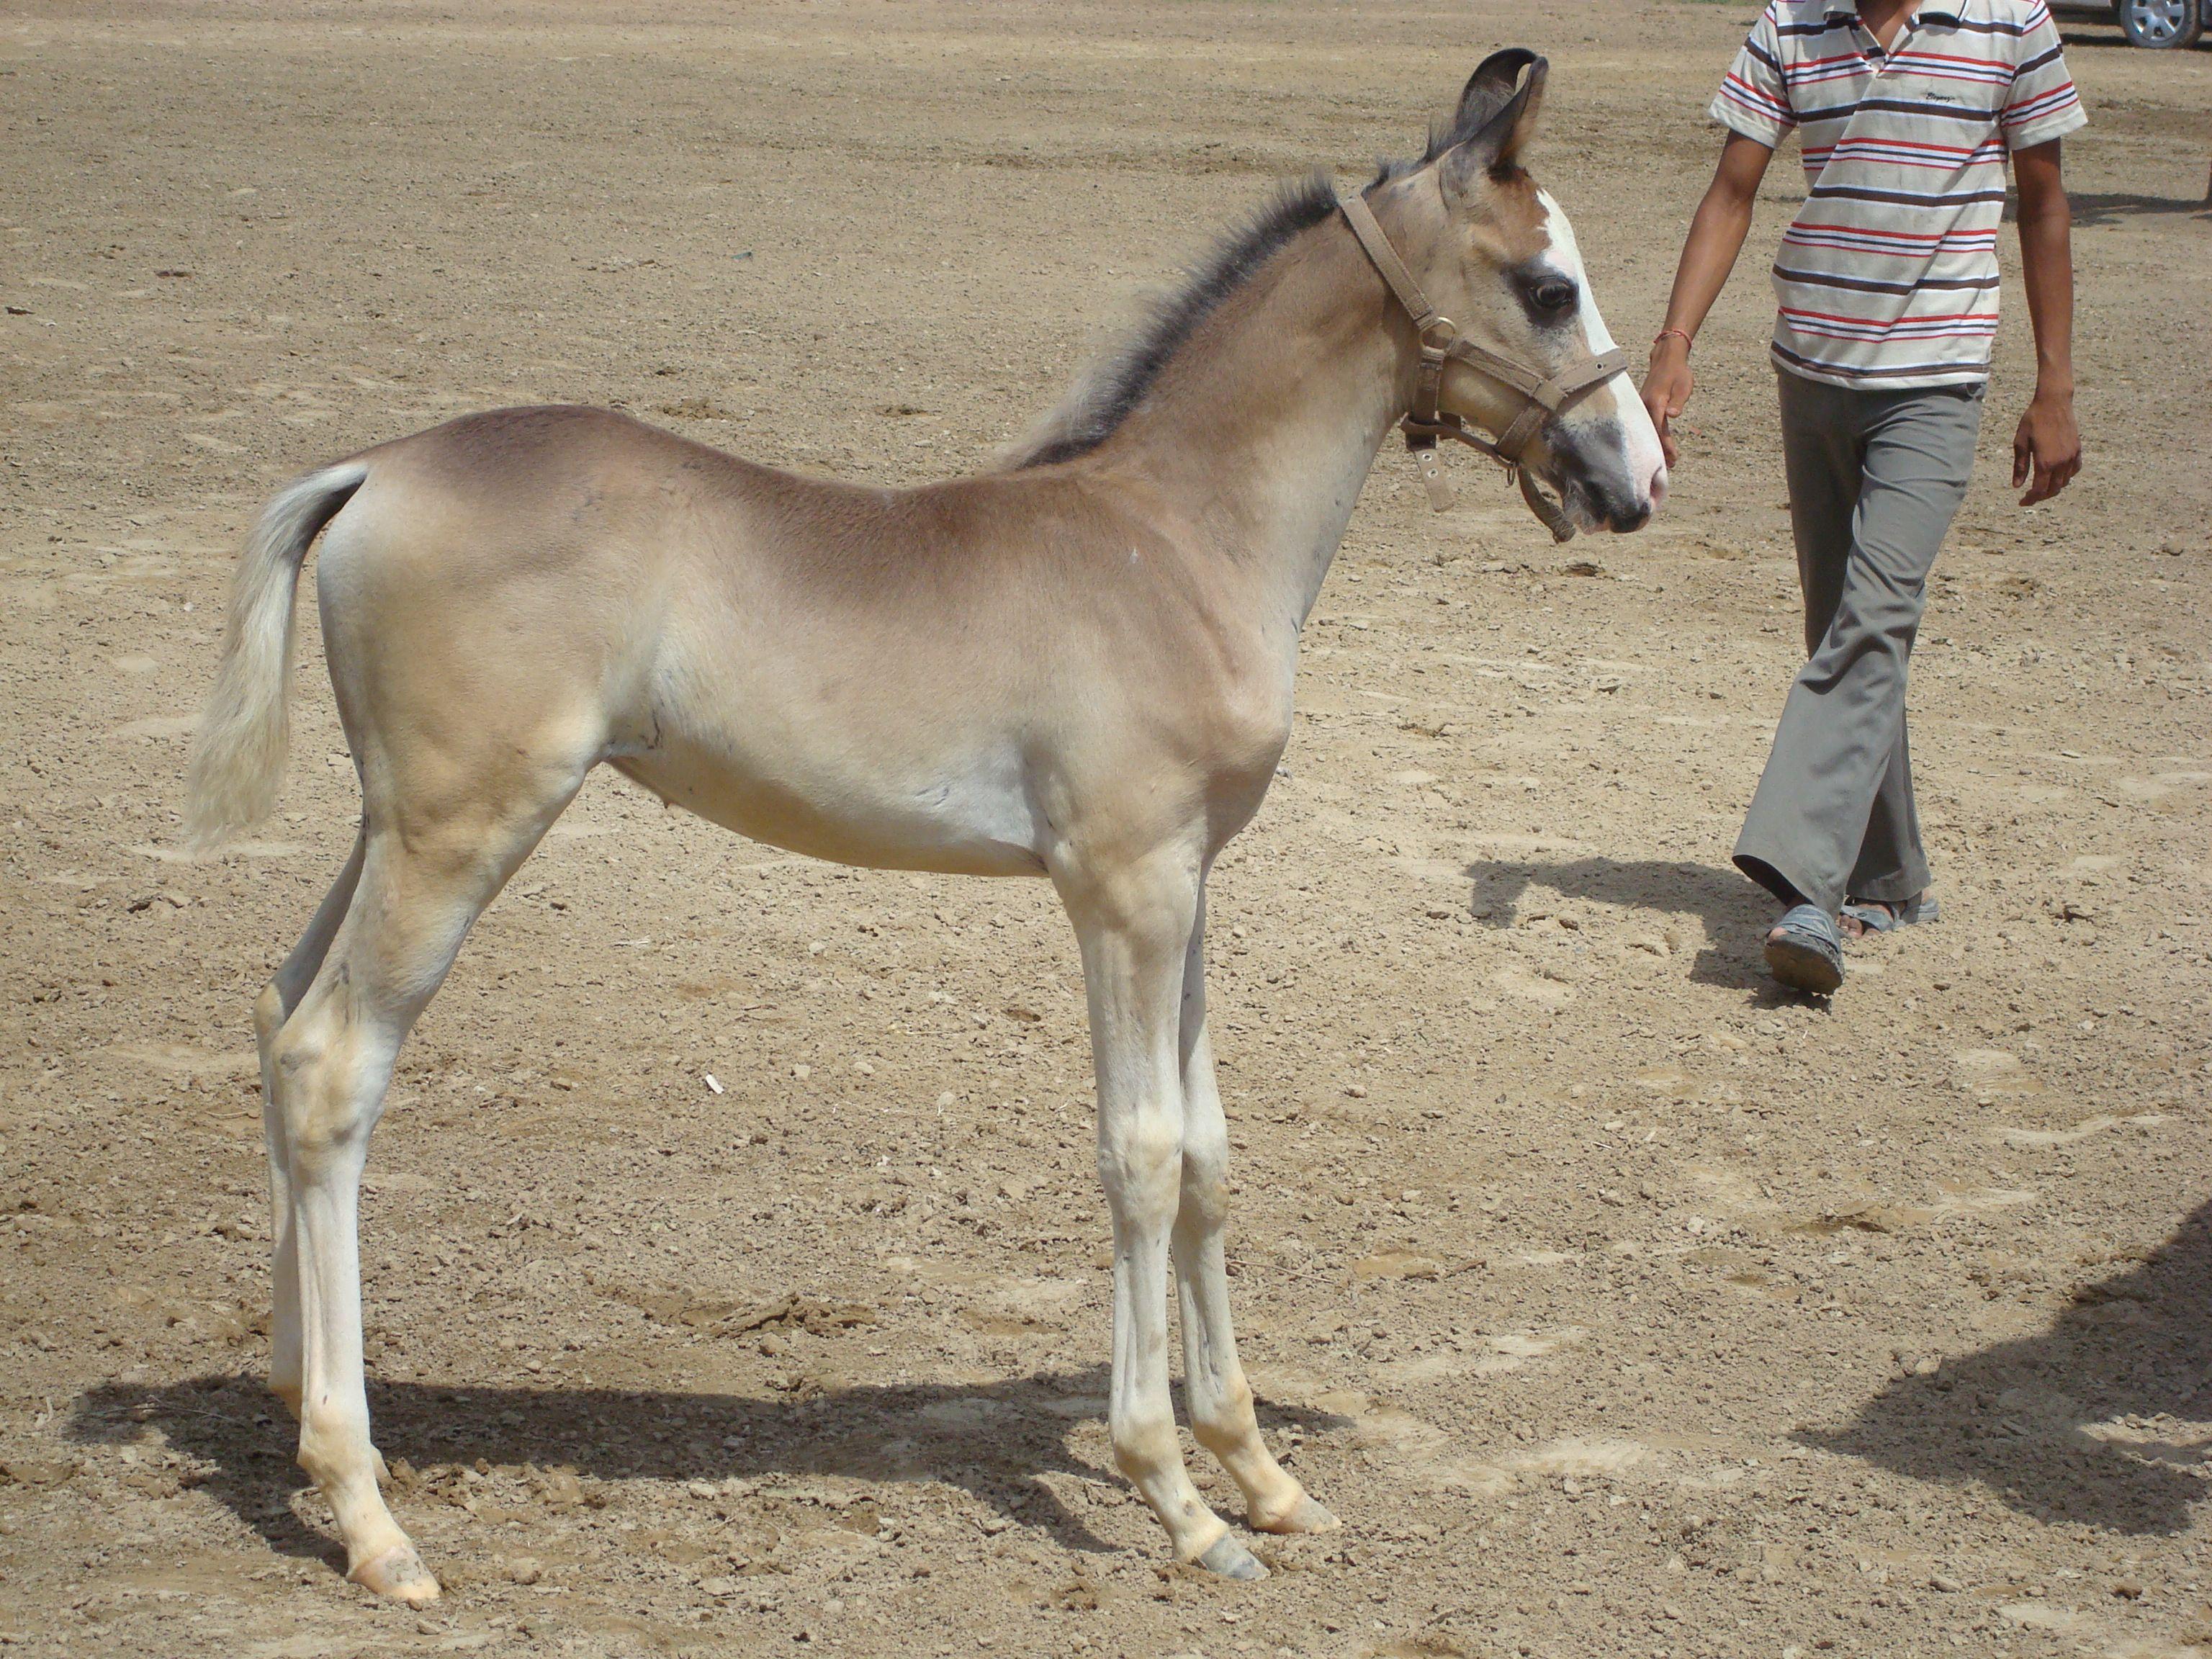 Horse Marwari foal pictures